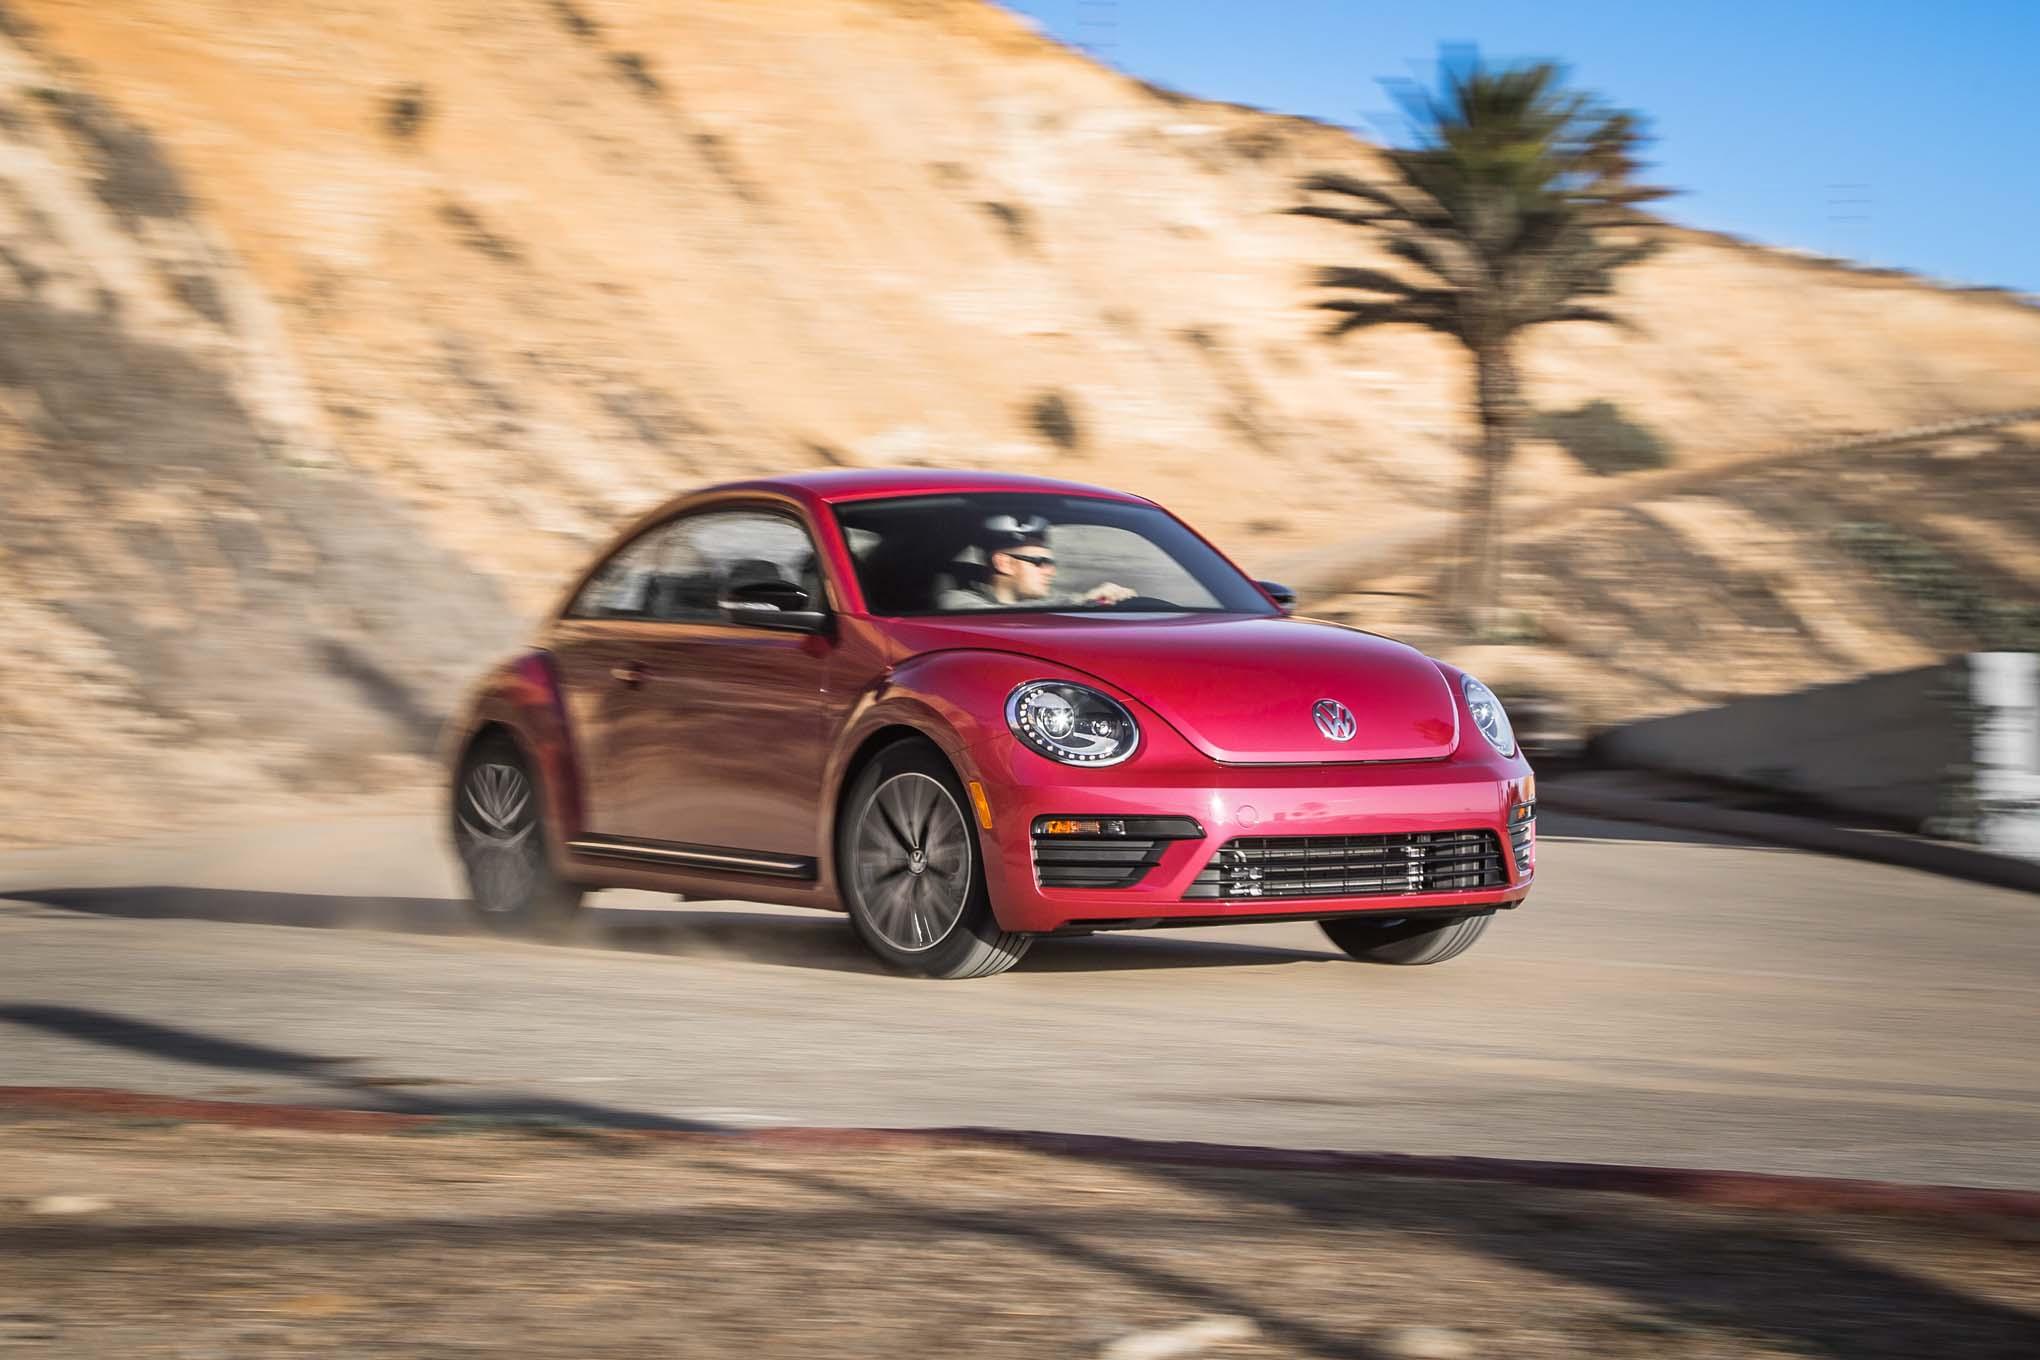 2017 Volkswagen PinkBeetle Front Three Quarter Turn